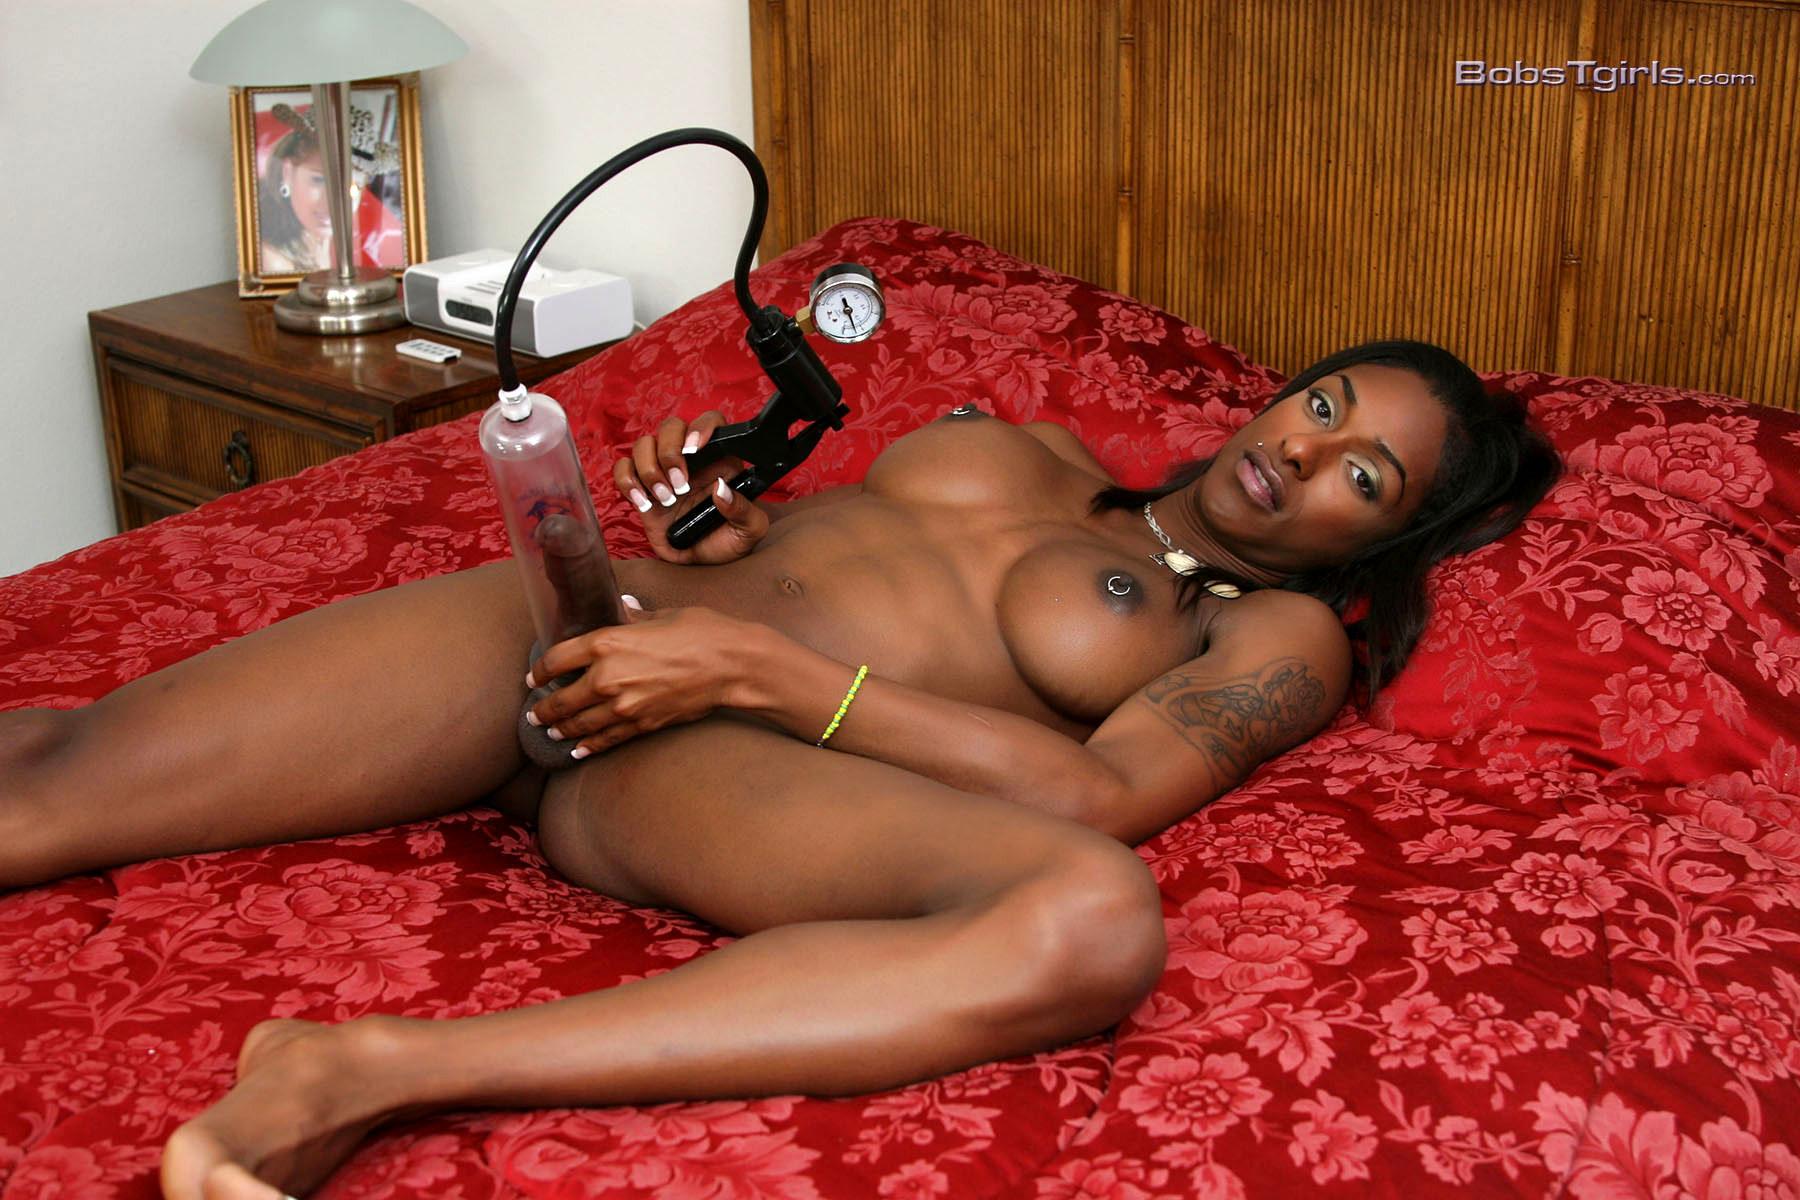 Chocolate Natalia Pumping Her Tool